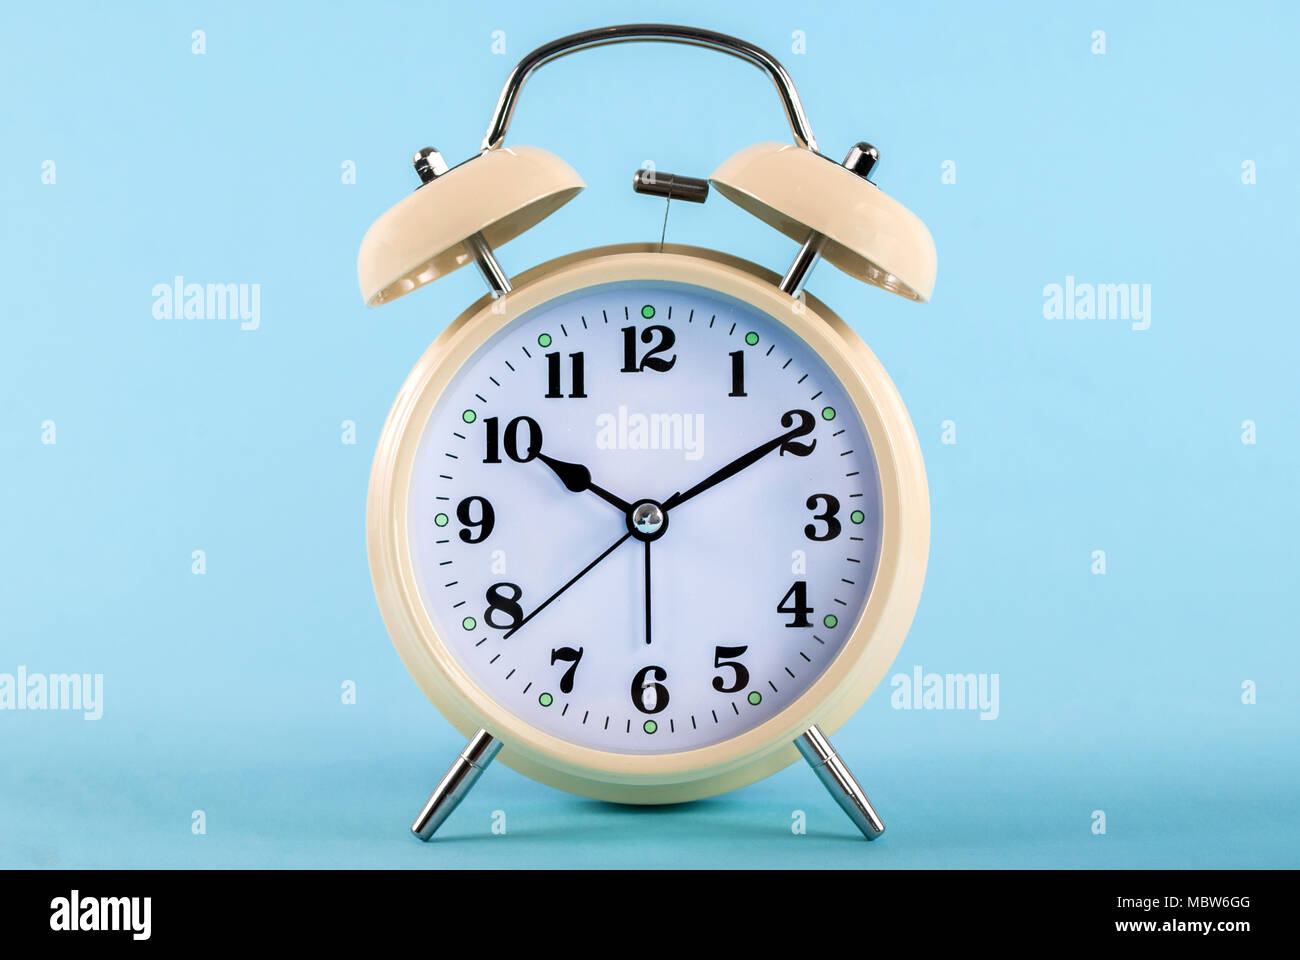 Old retro clock isolated on blue background - Stock Image